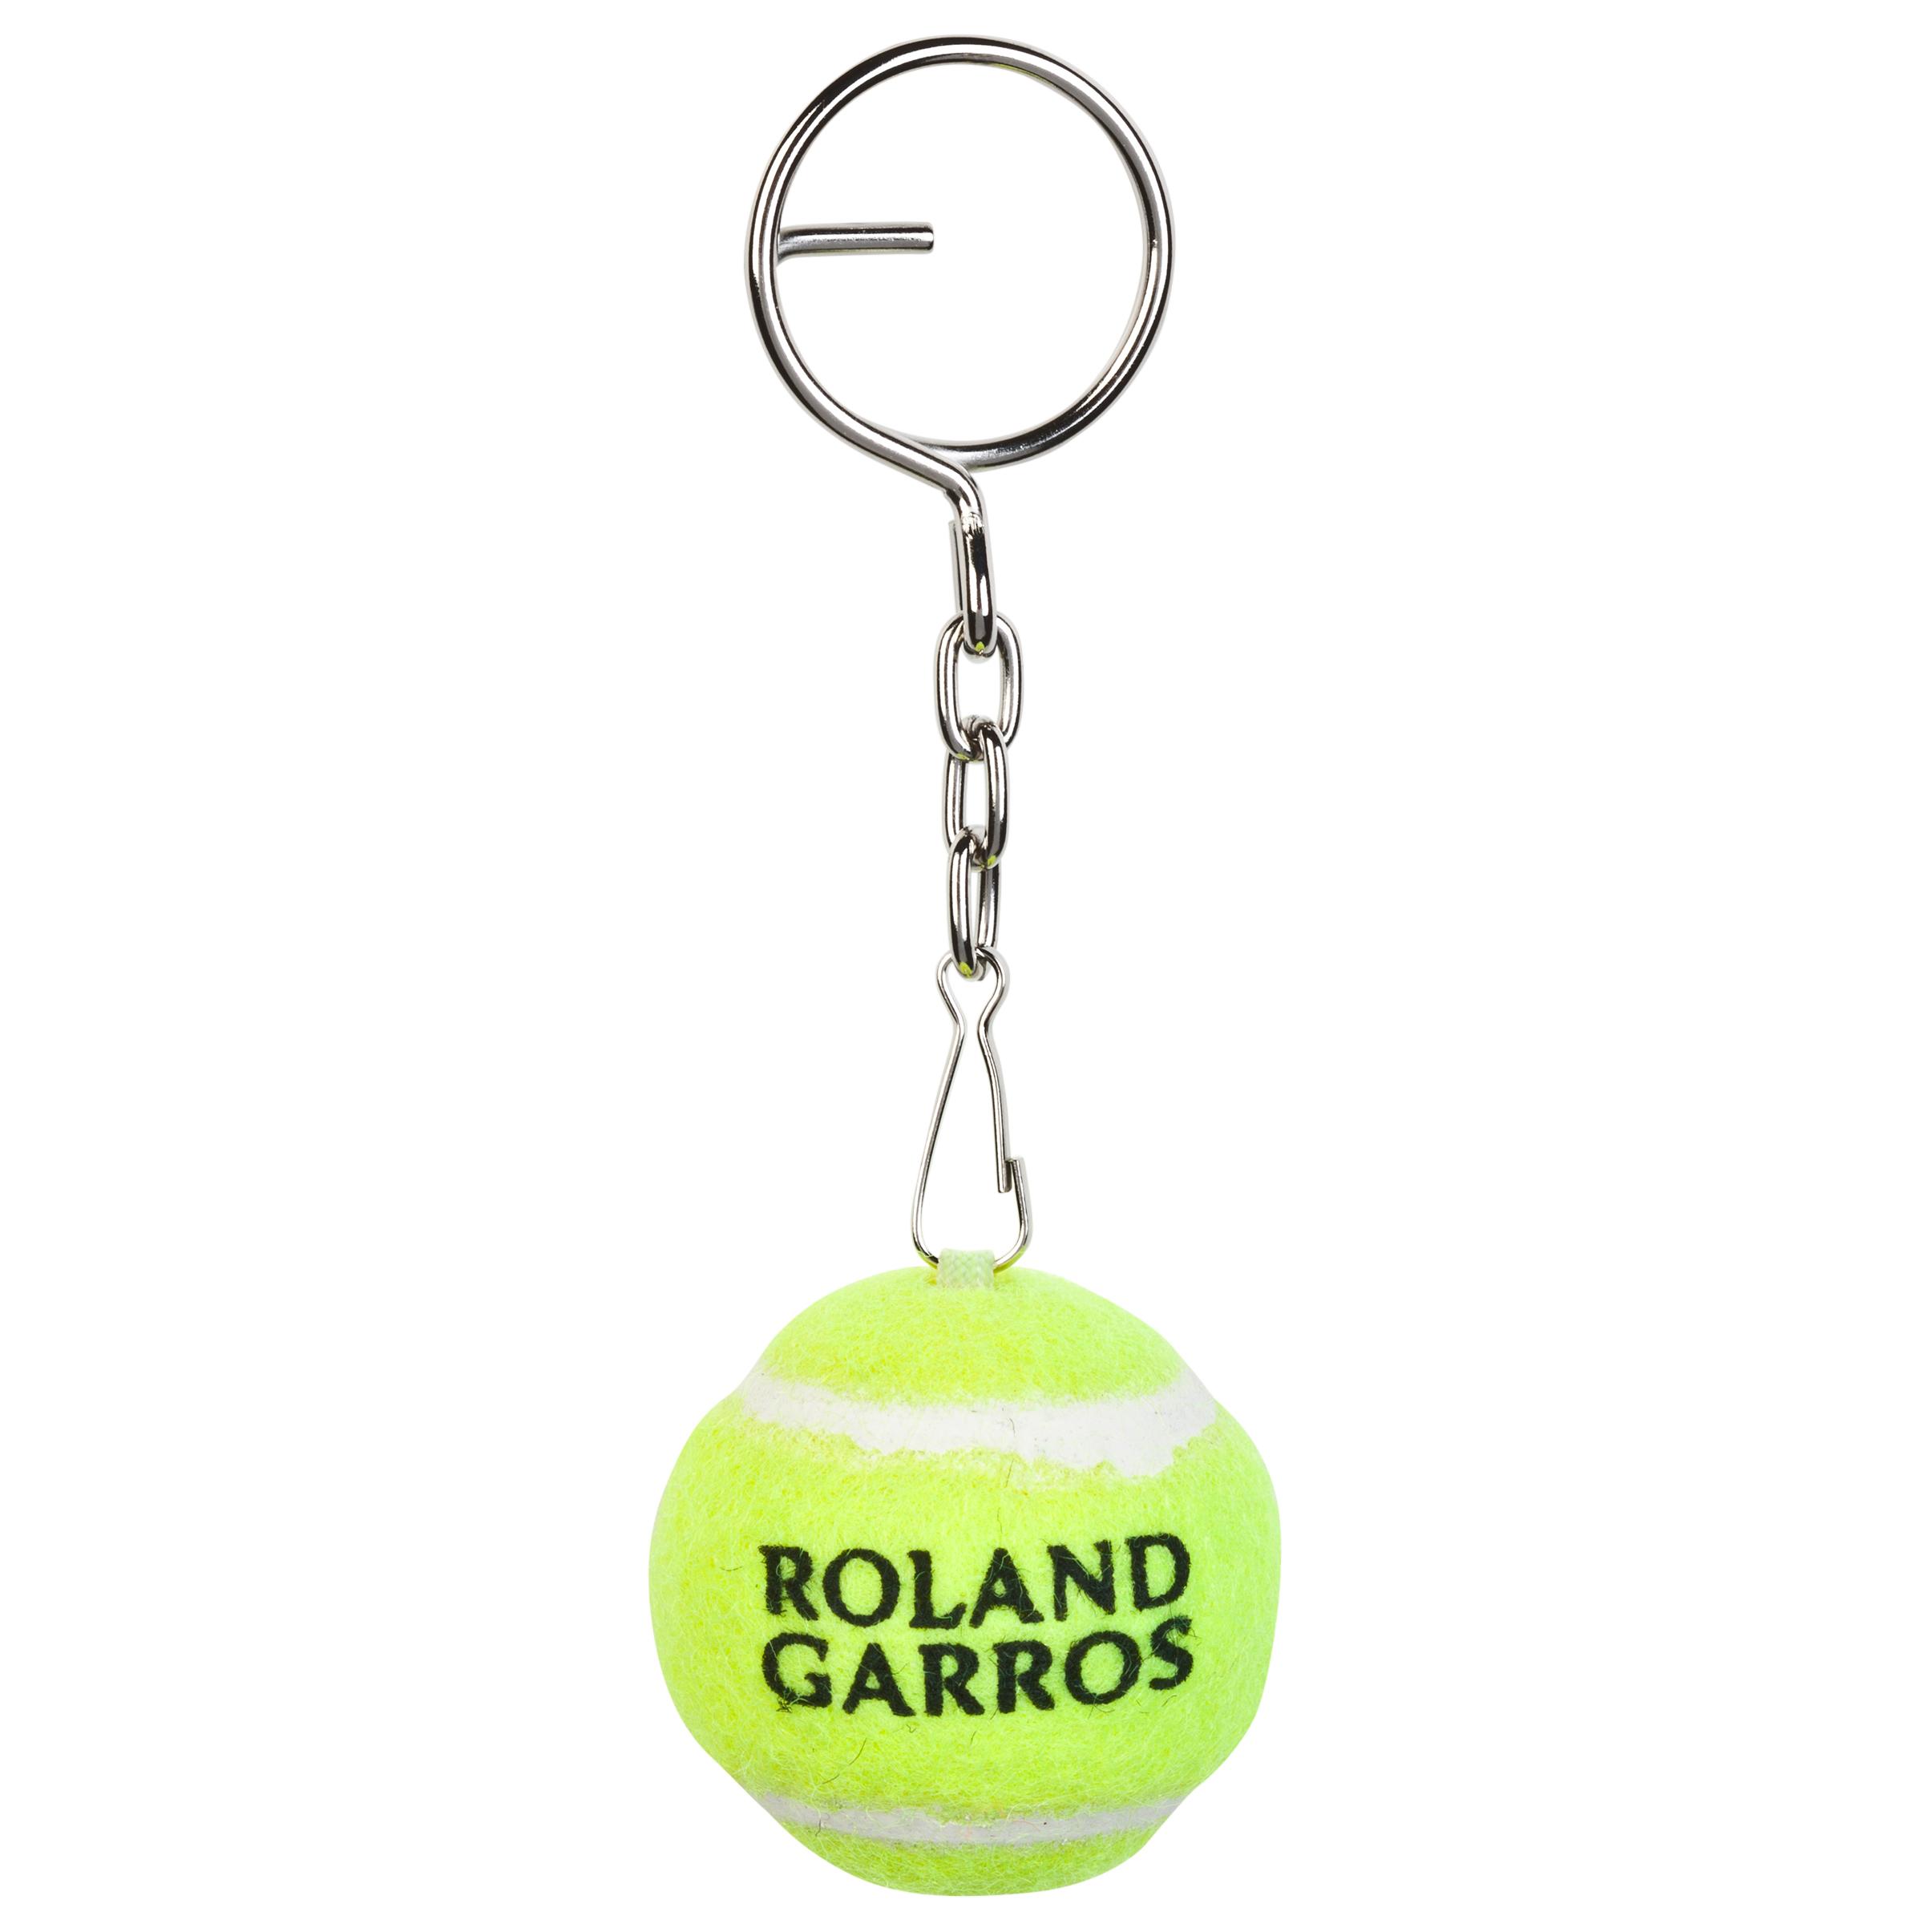 Roland-Garros Babolat Ball Keyring Yellow